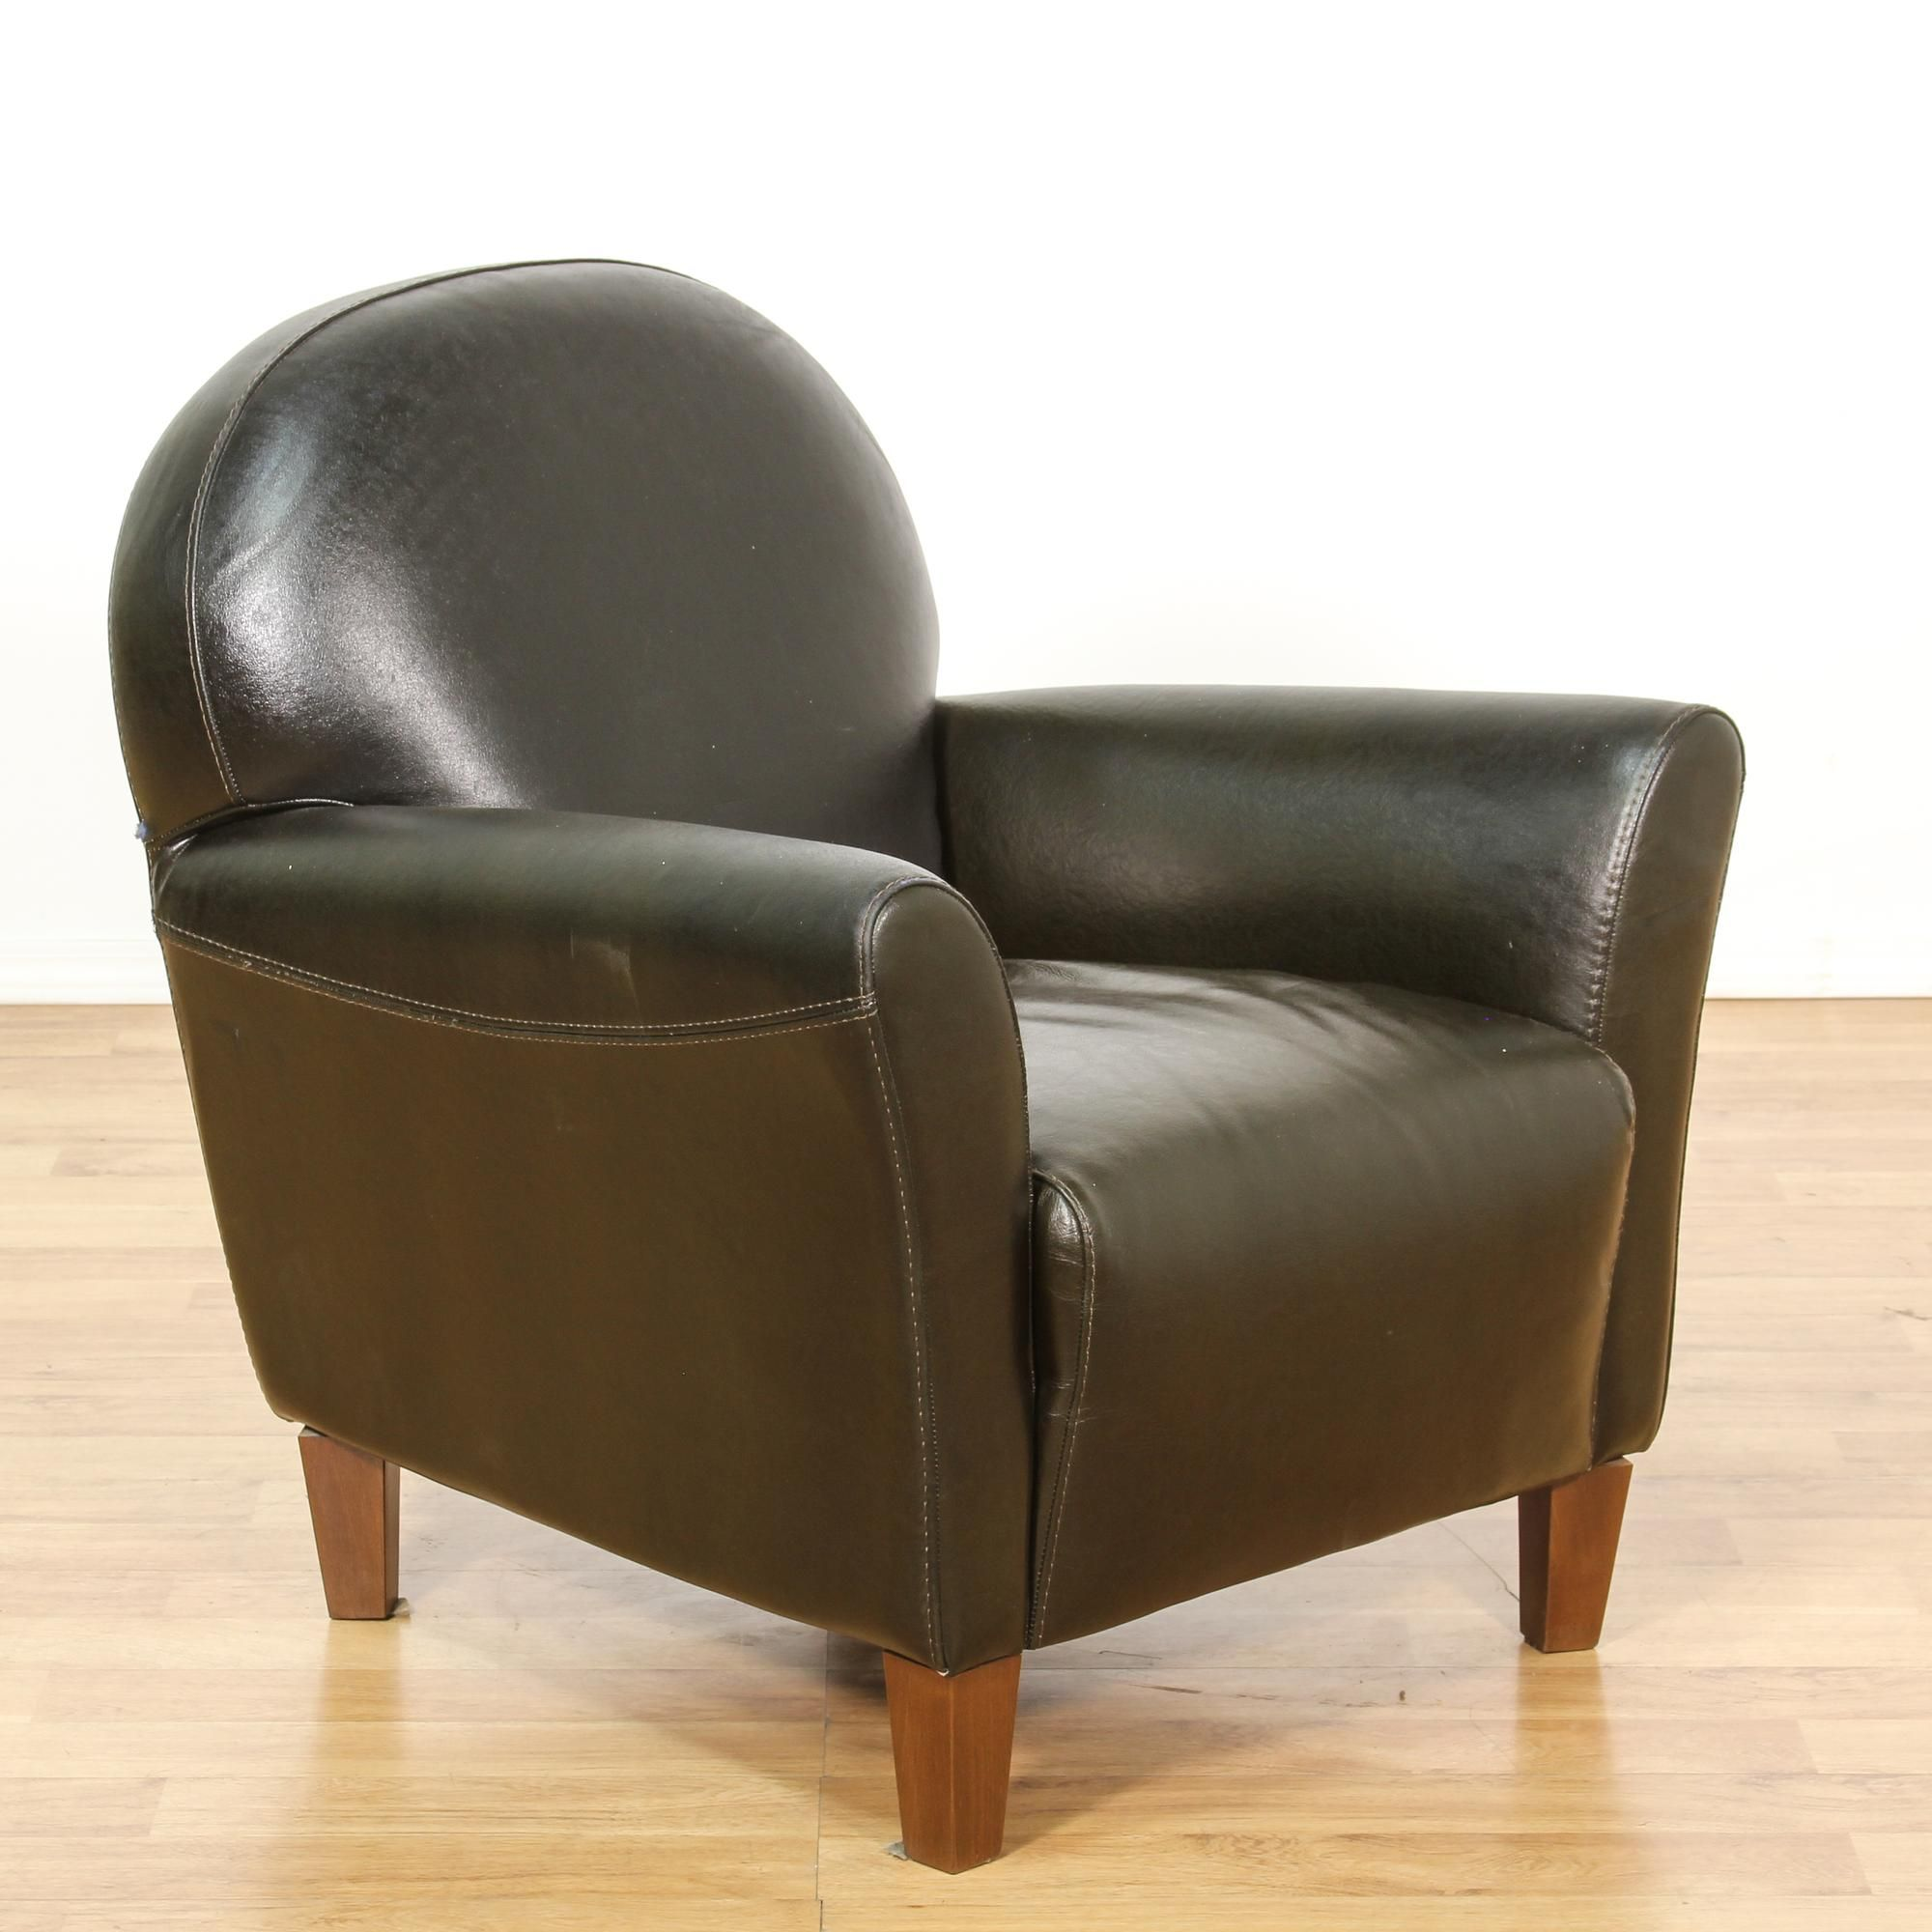 "Calia Italia"" Black Leather Armchair"